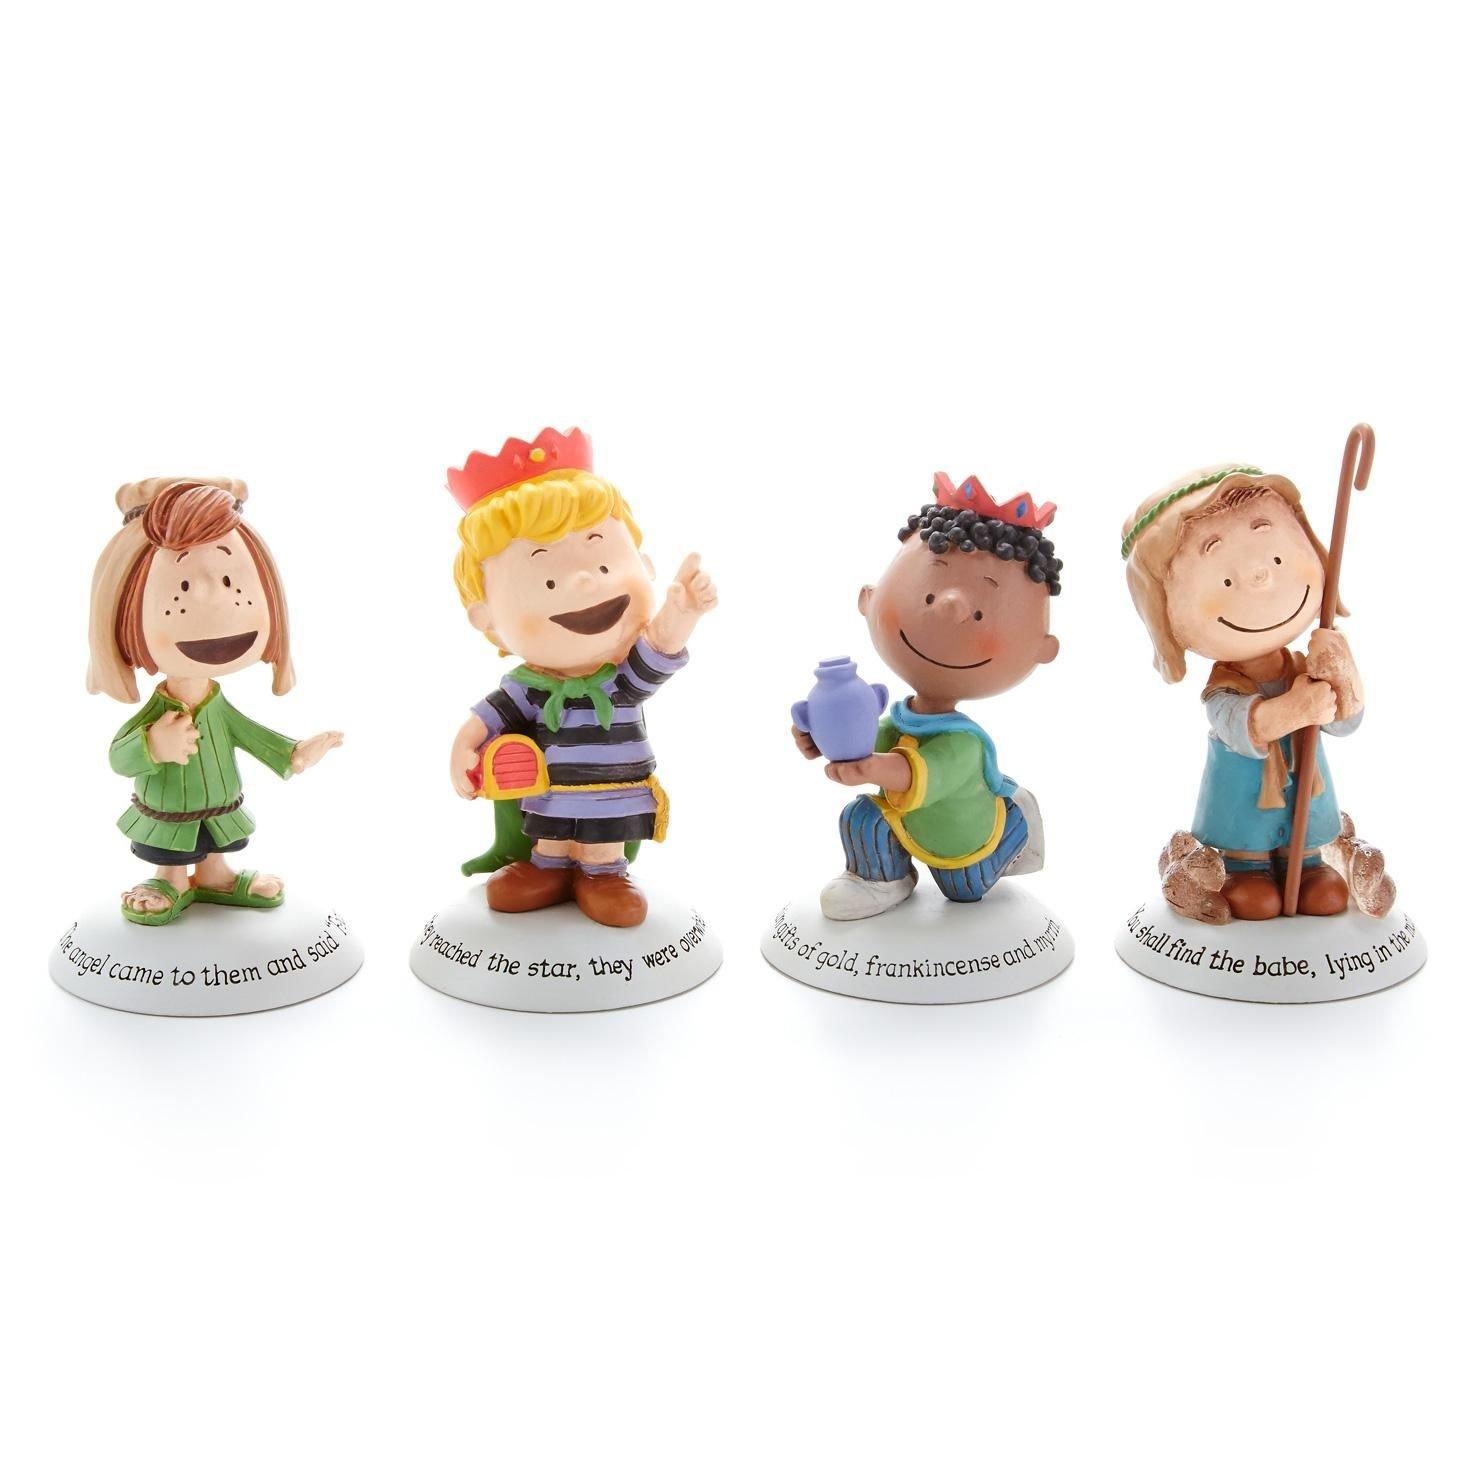 Hallmark 2014 Glad Tidings Peanuts Nativity Additional Characters Set - Set of 4 Figurines - (Nativity Accessories) - #XKT1446 6145461